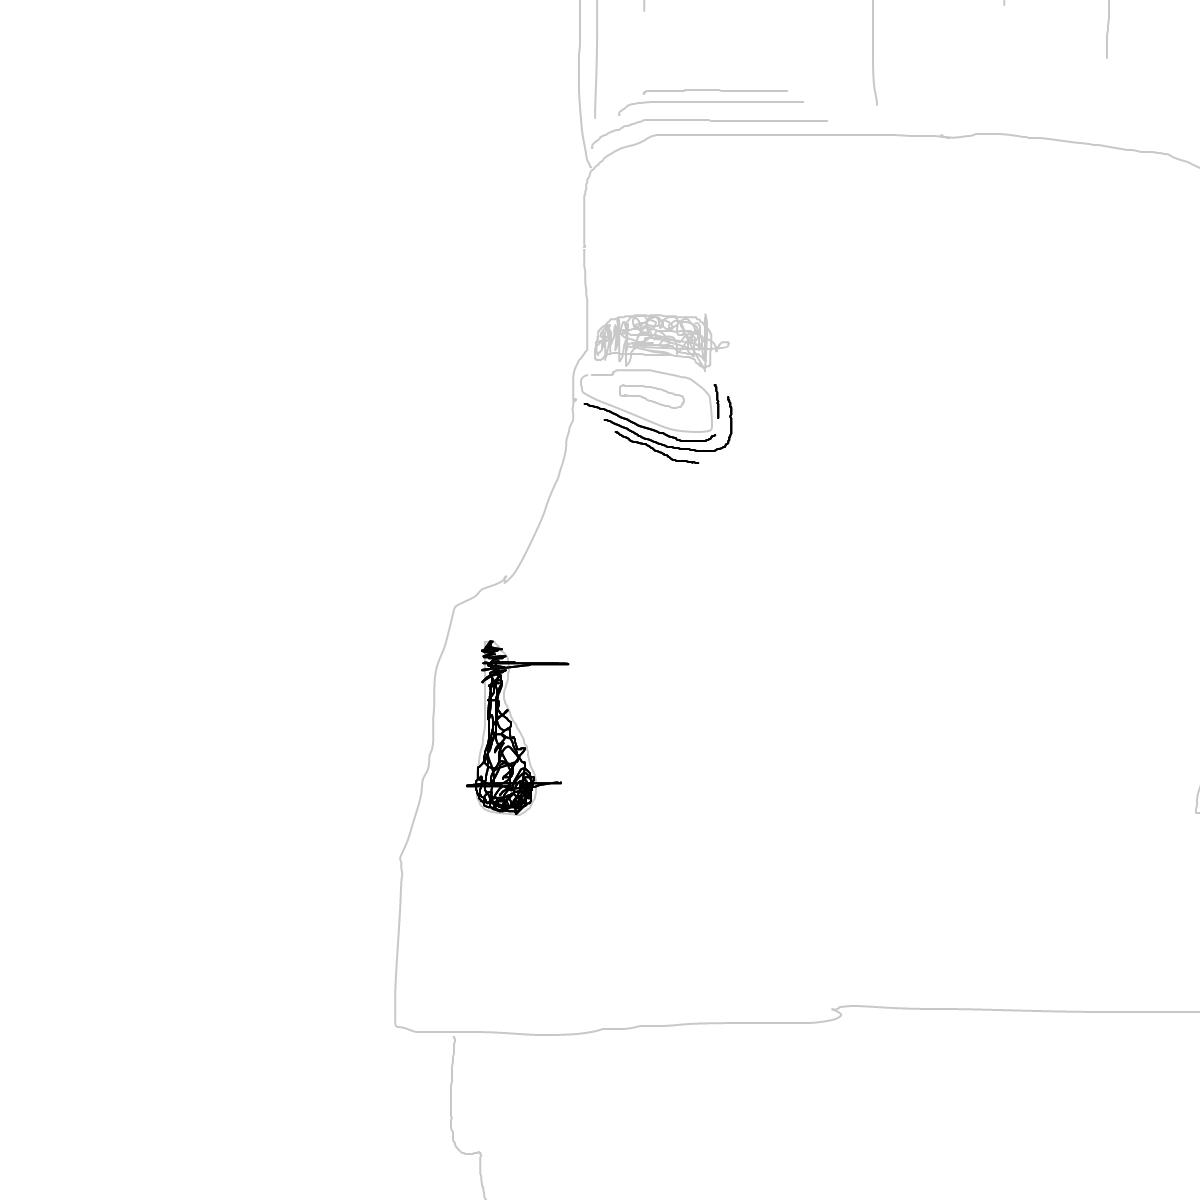 BAAAM drawing#23736 lat:46.5347671508789060lng: 6.3308215141296390